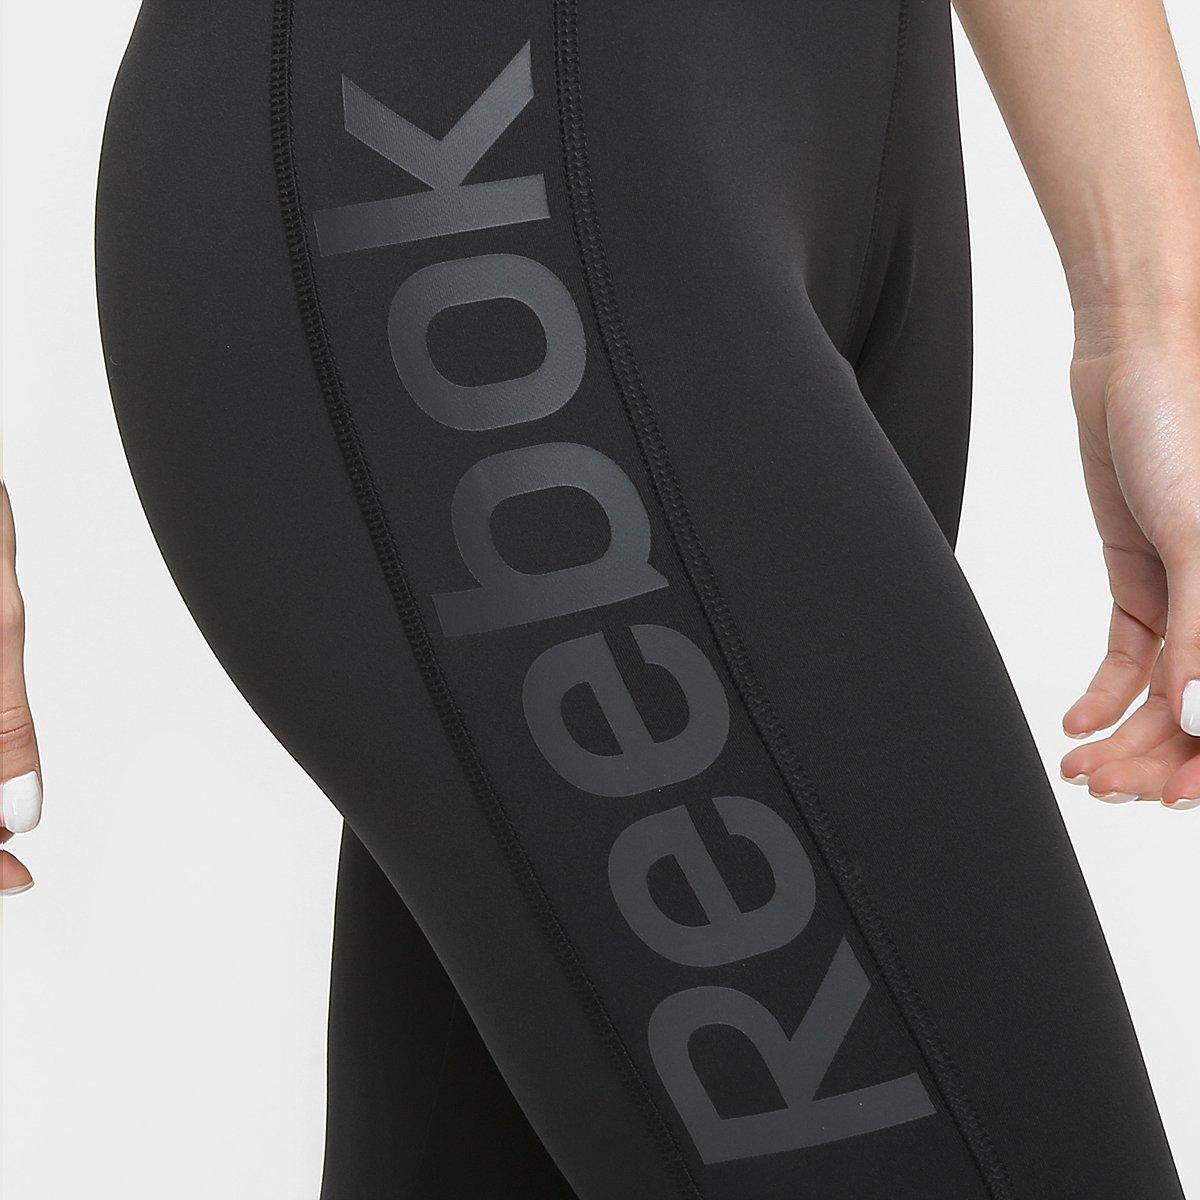 Calça Workout Reebok Calça Legging Preto Feminina Legging nnarW7